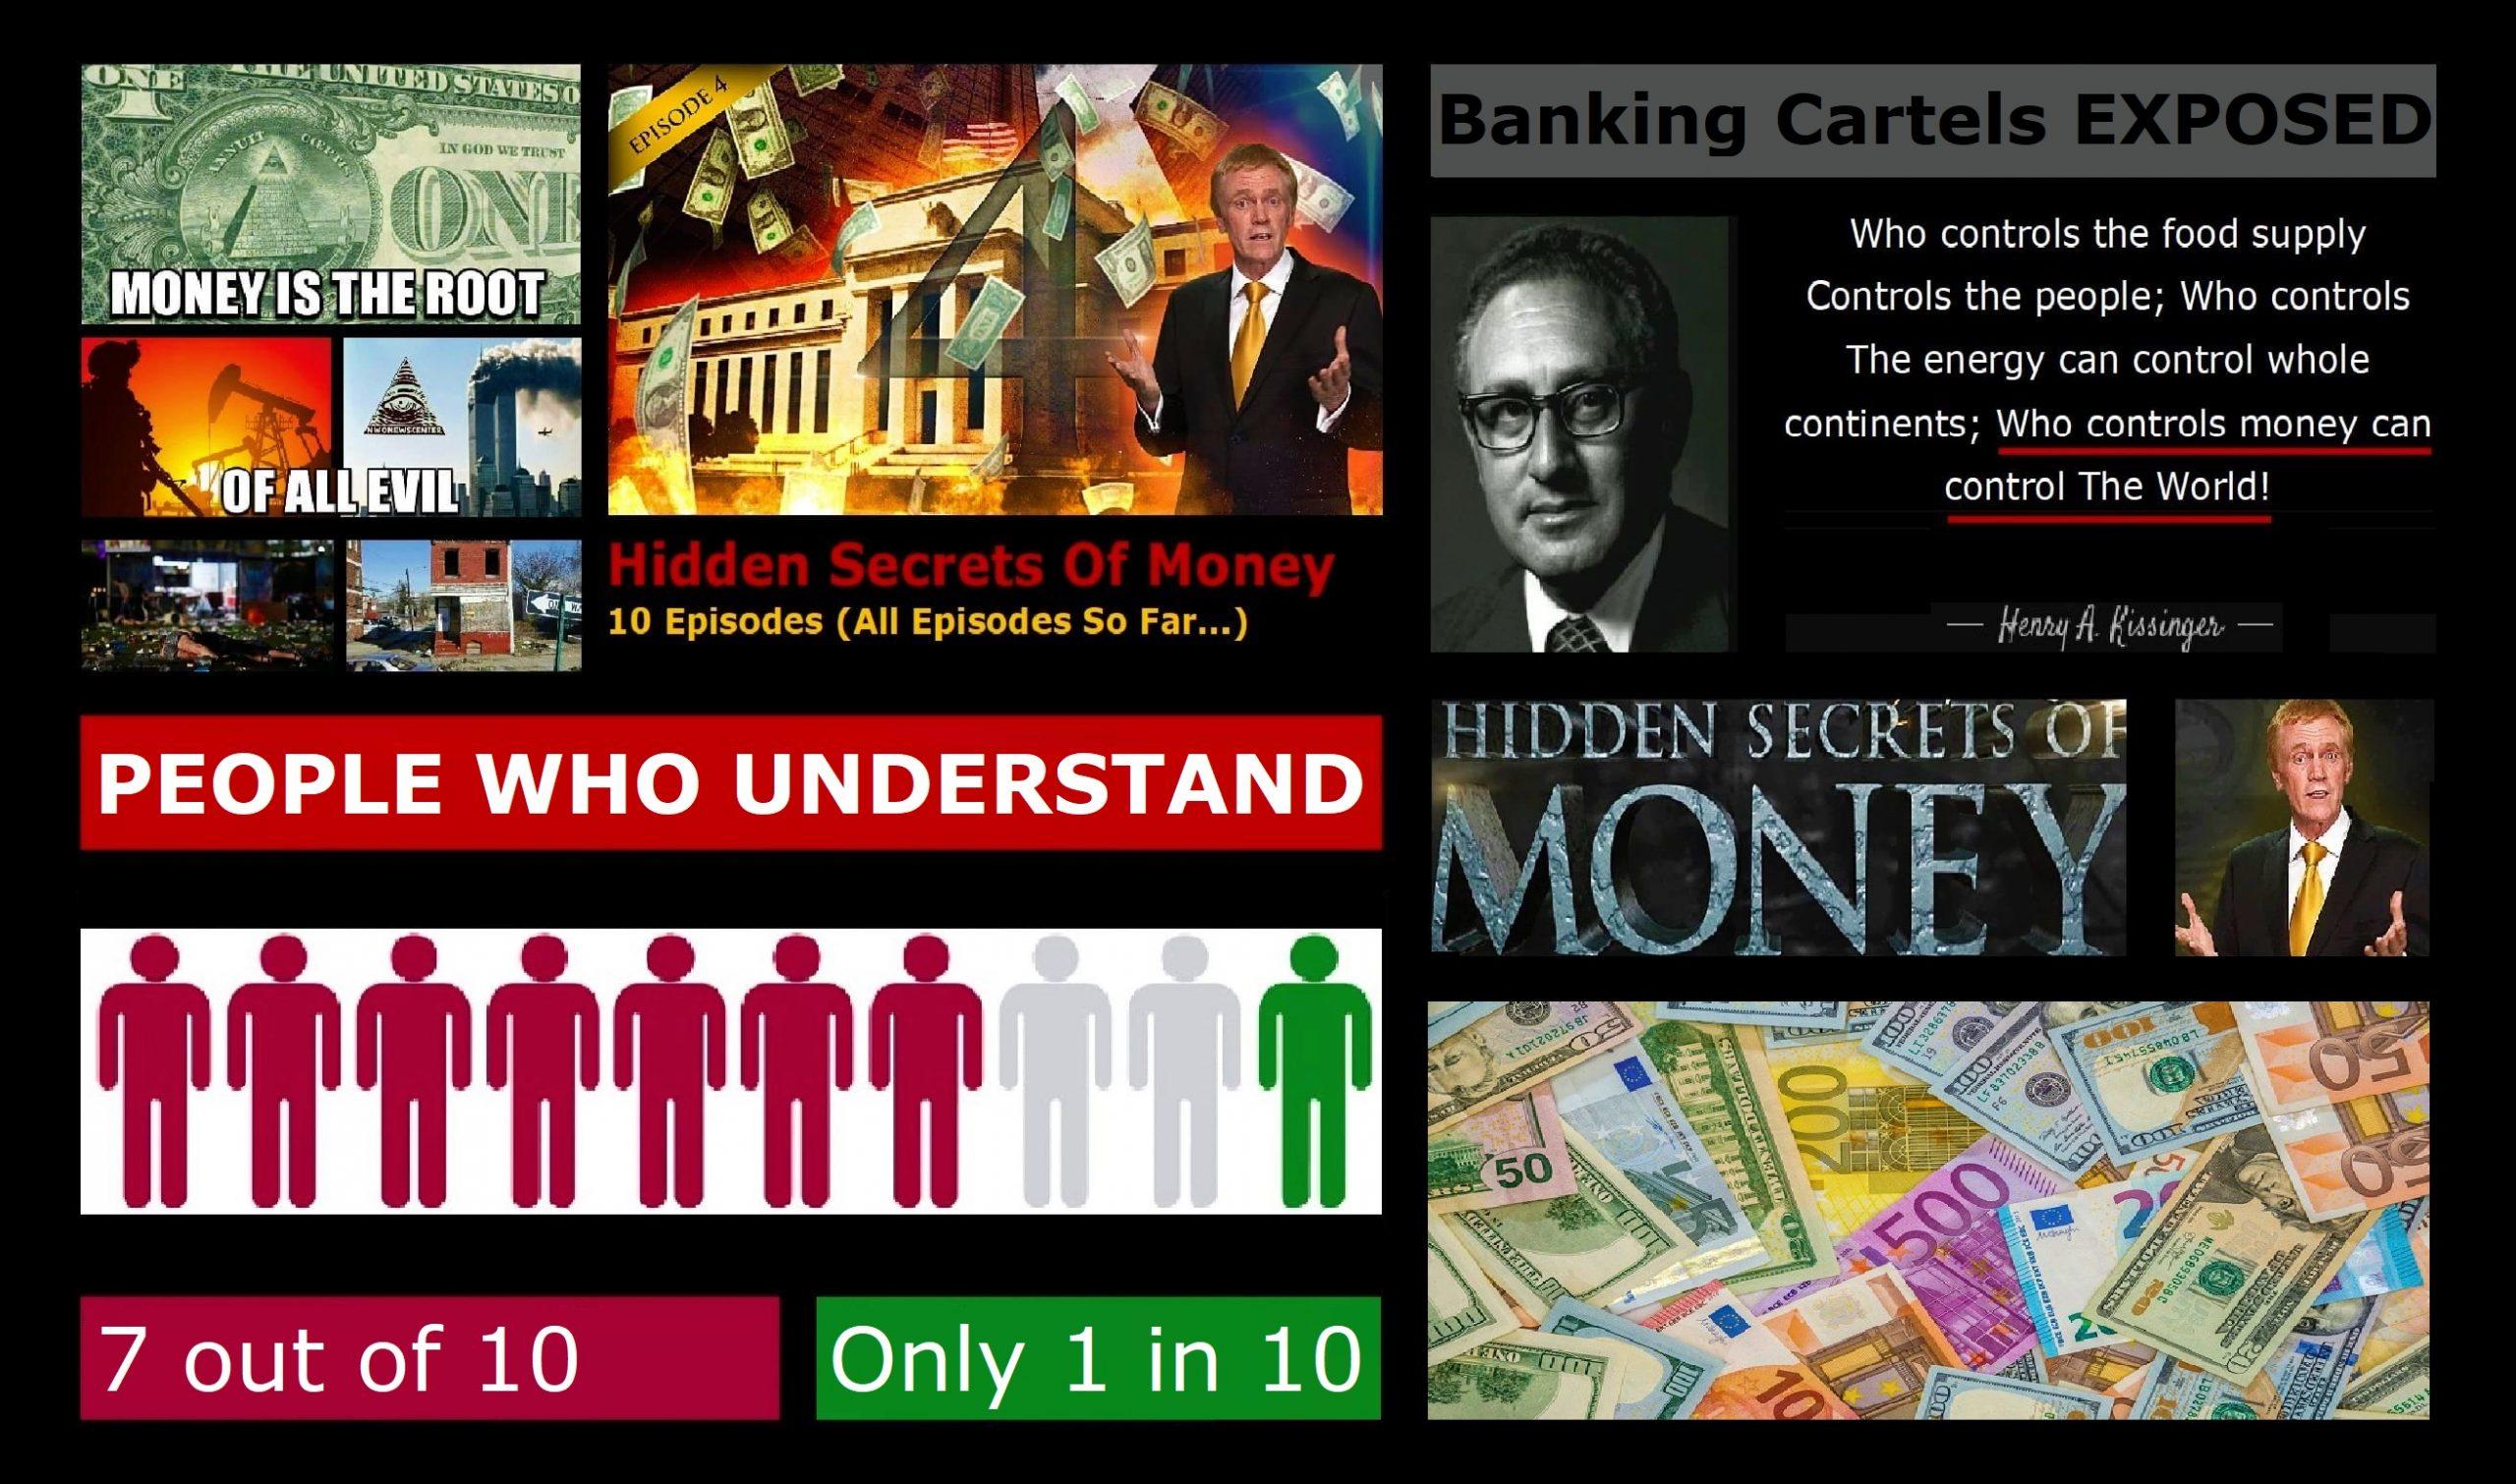 Hidden Secrets Of Money